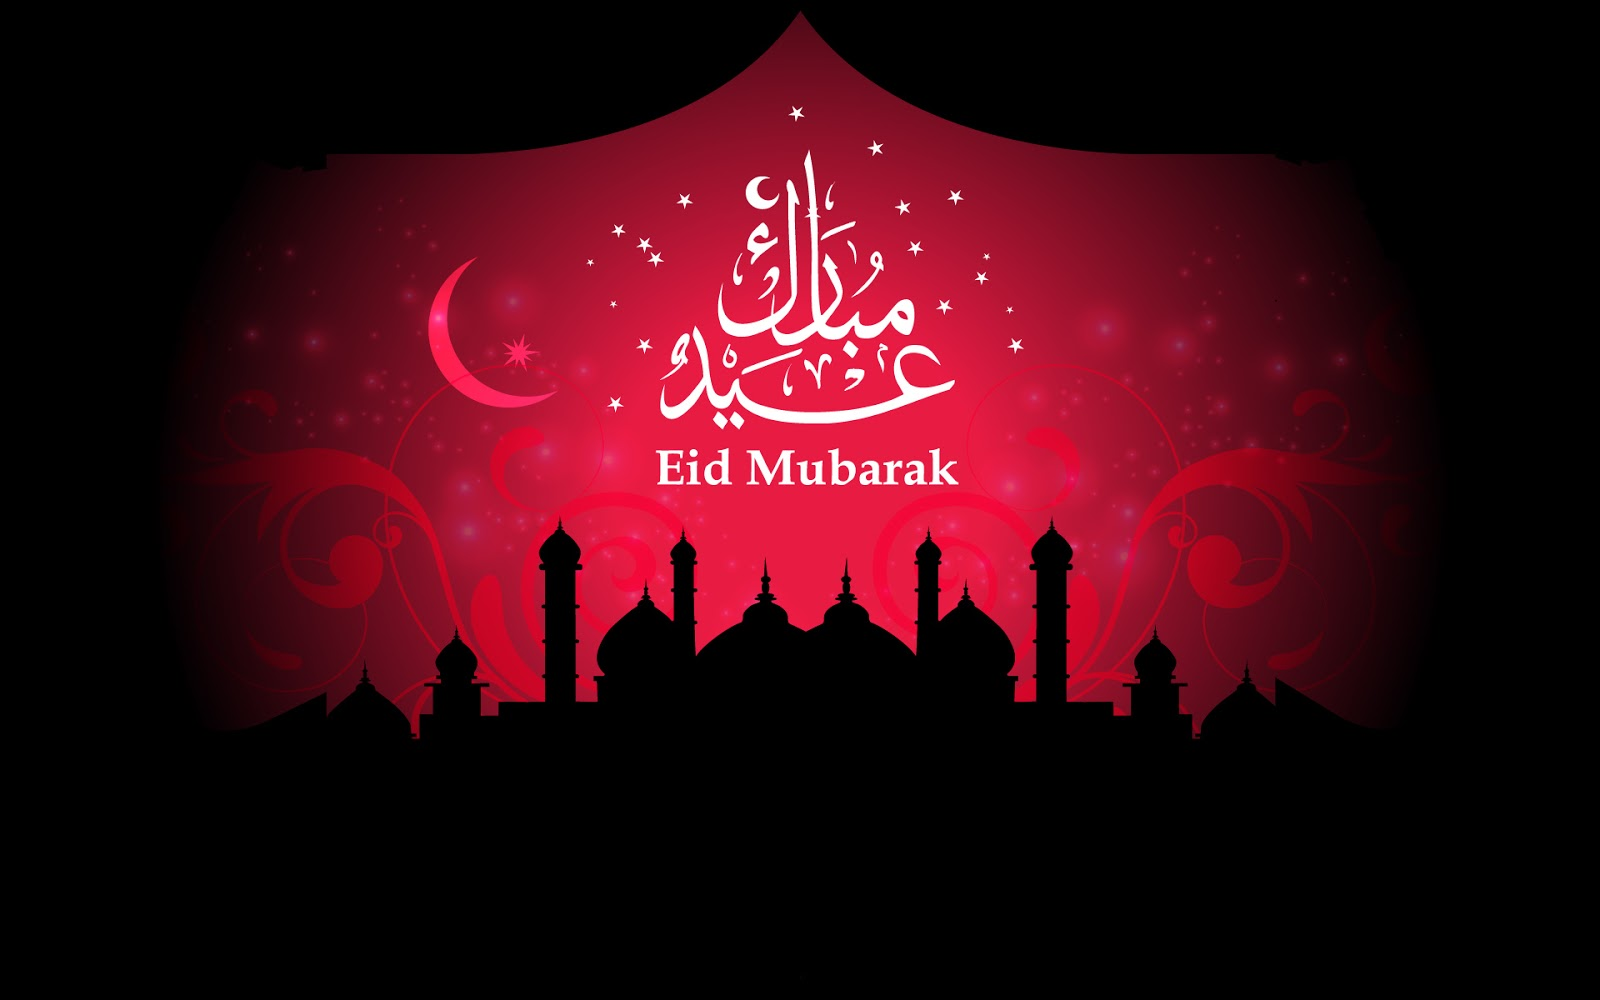 Eid Mubarak wallpaper 4